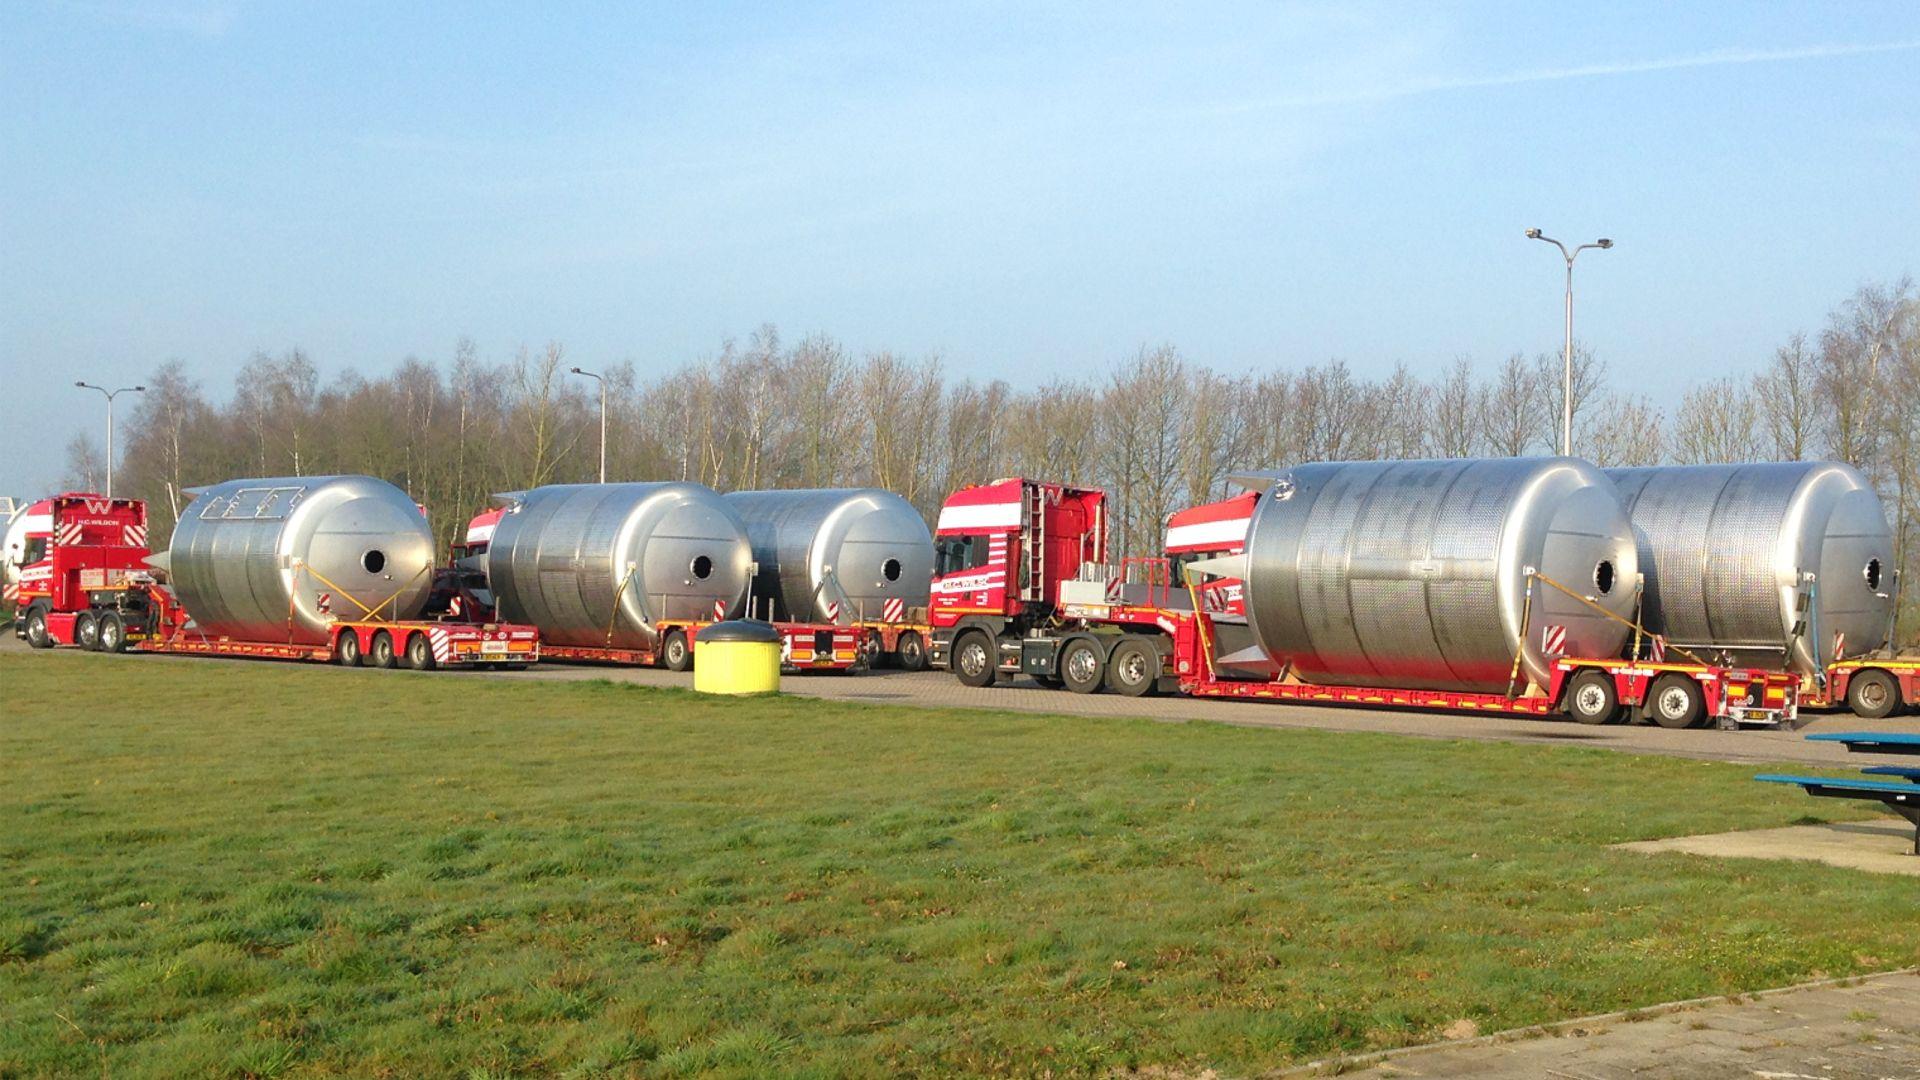 Permalink to: Transport Begeleiding Venlo 3